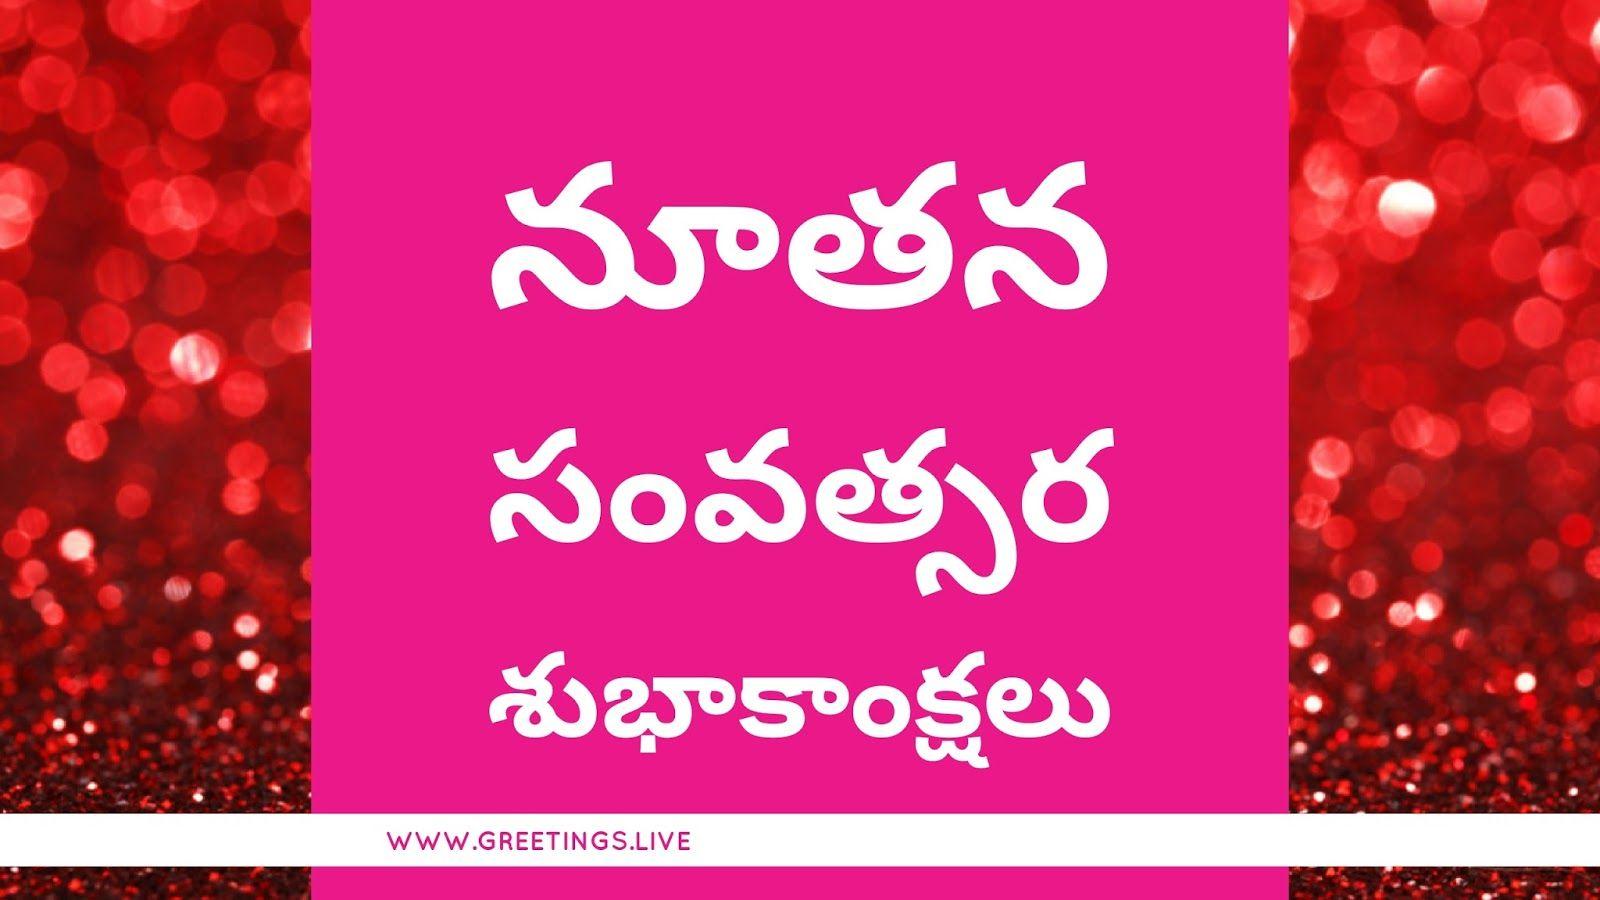 Telugu Greetings On New Year 2018 Greetings Live Pinterest Telugu